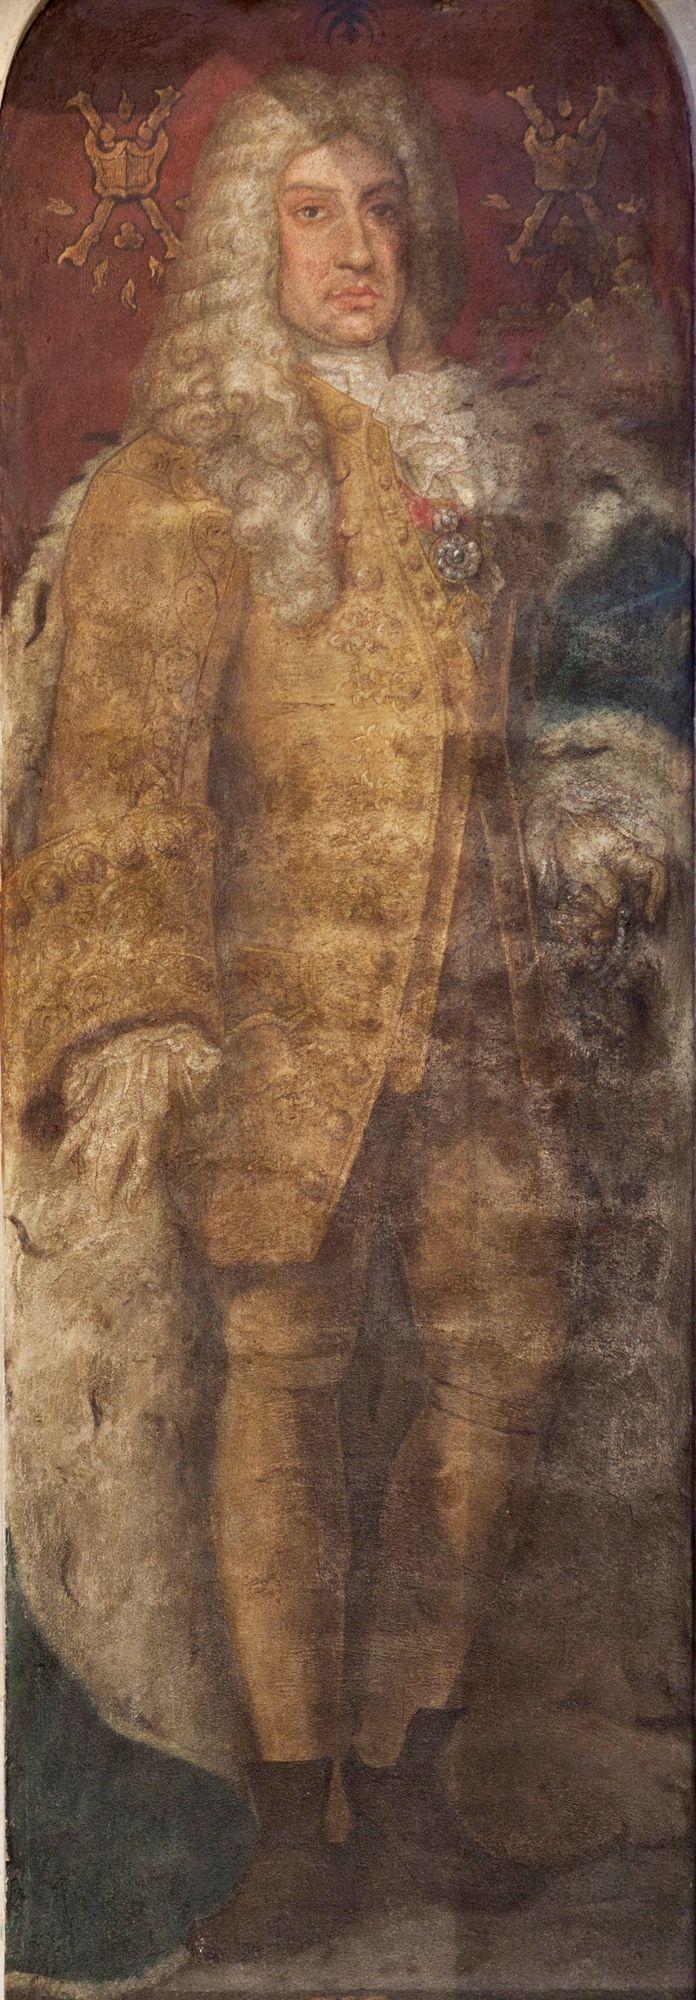 1711 - 1740 Karel VI